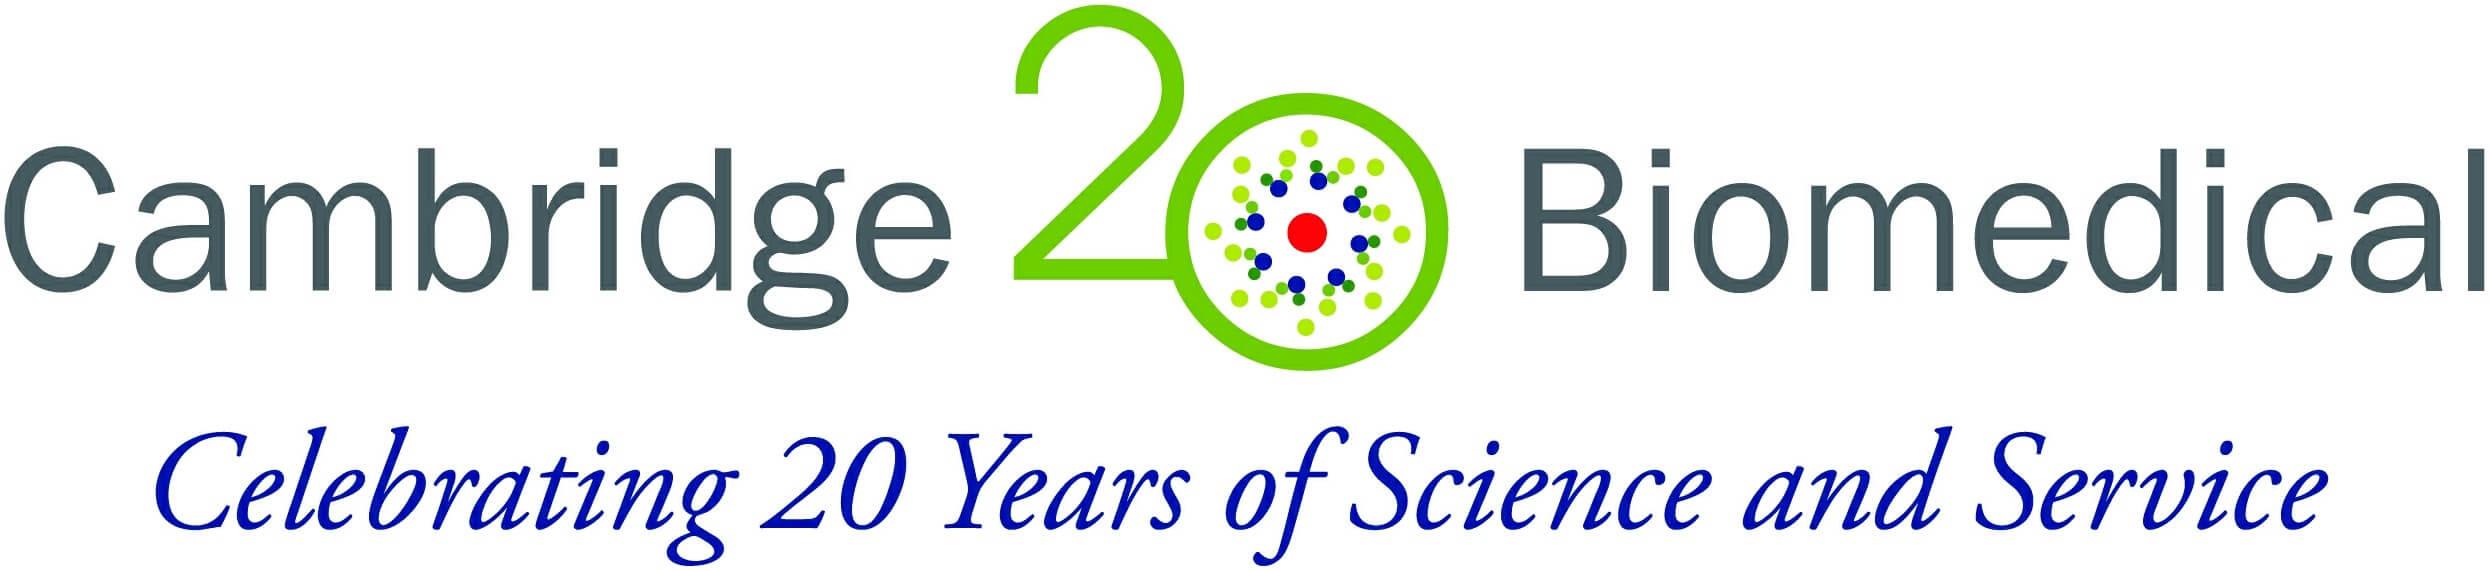 Cambridge Biomedical Research